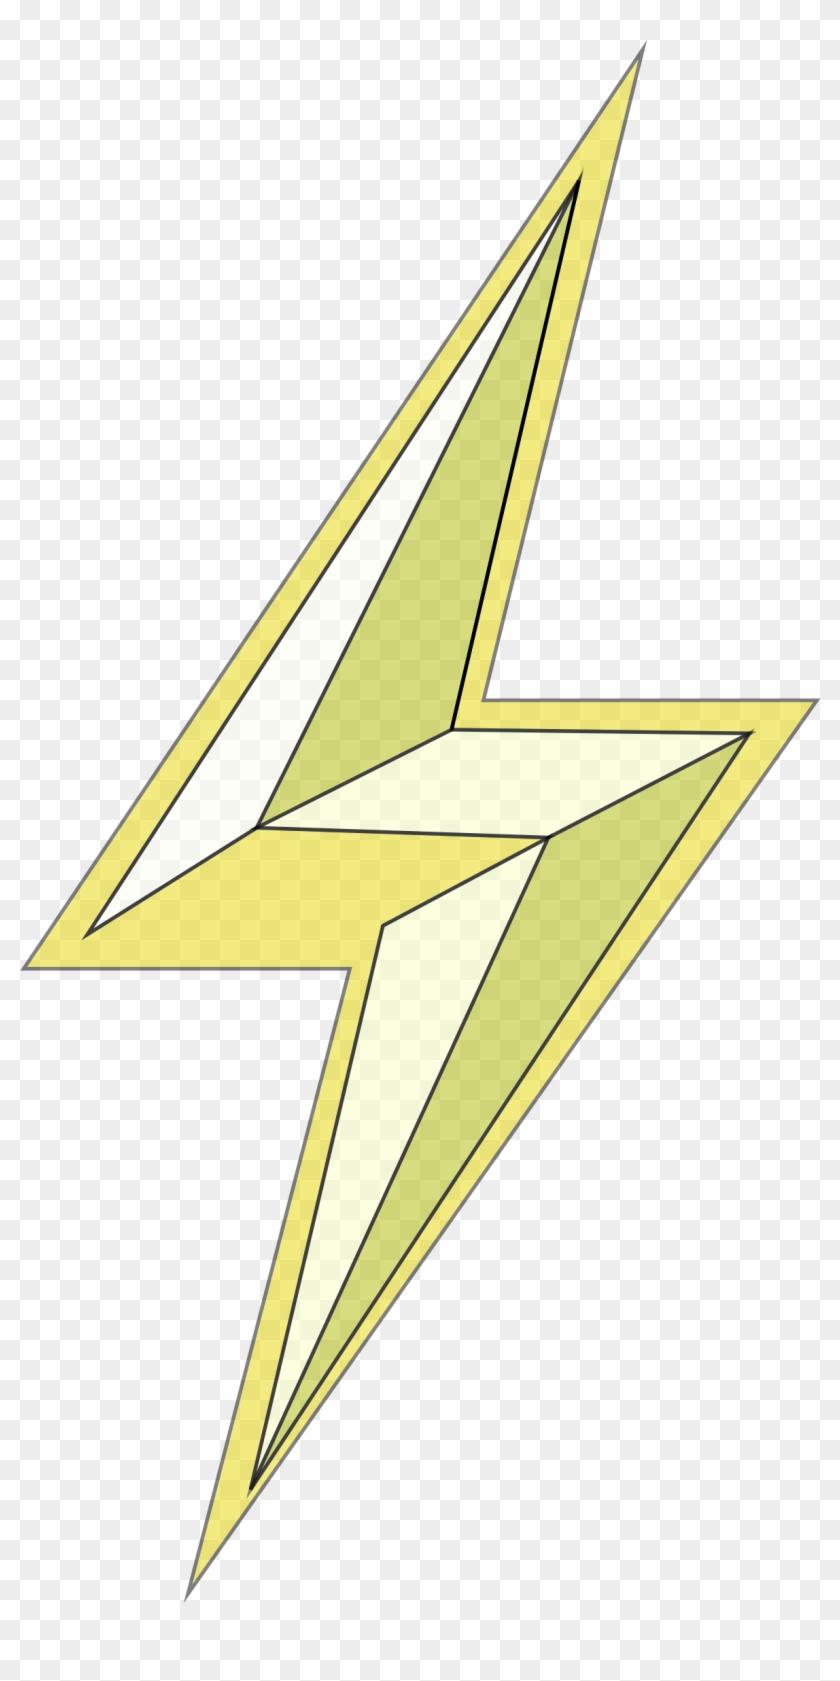 D clip art lightning. D20 clipart stylized